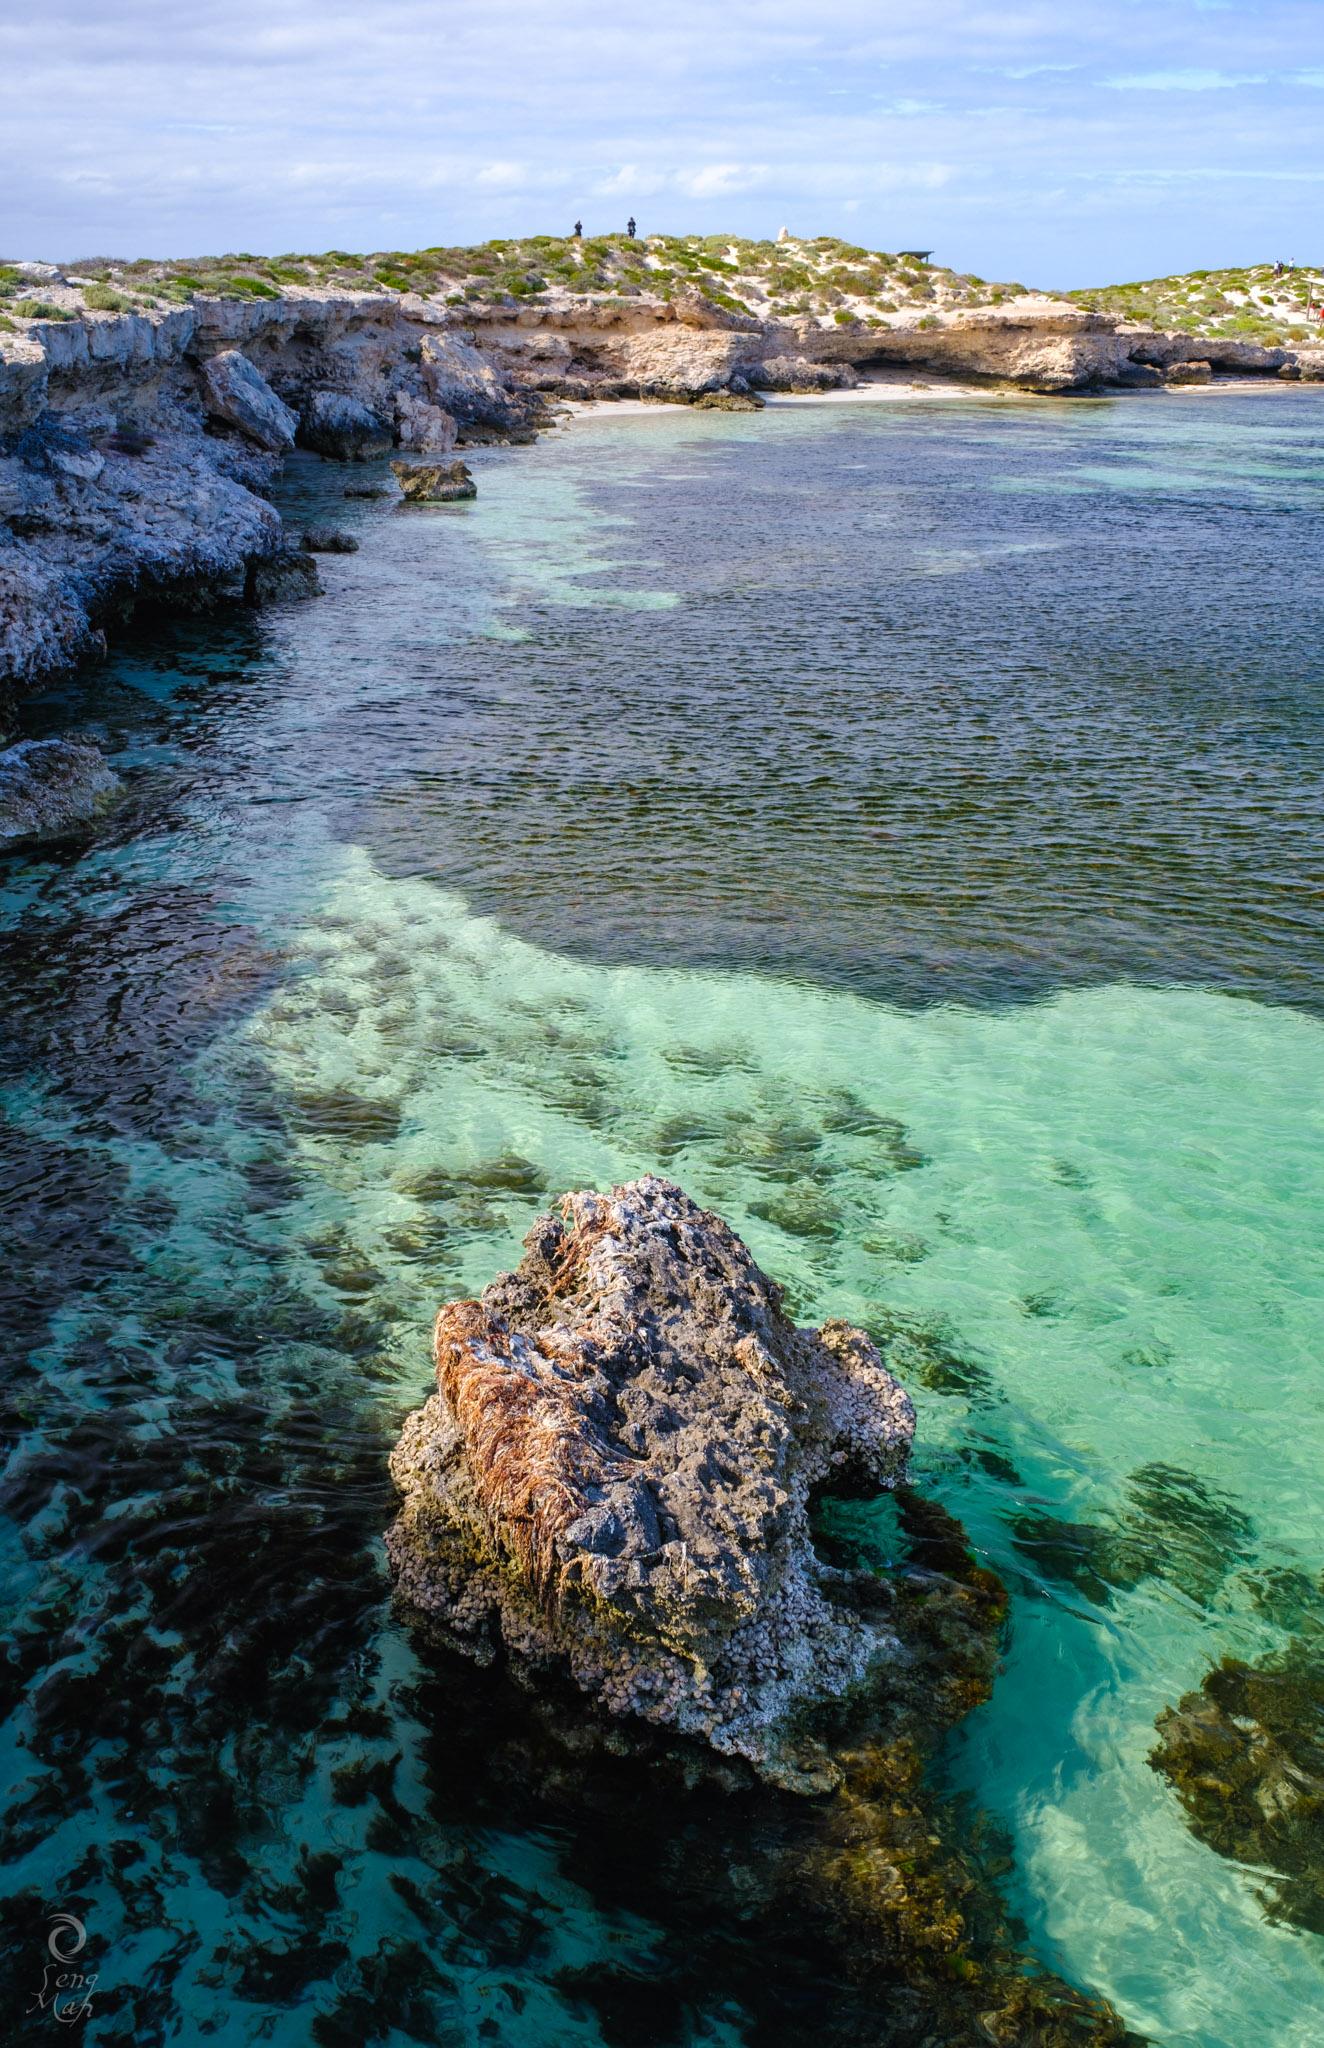 Wallabi Island Cove